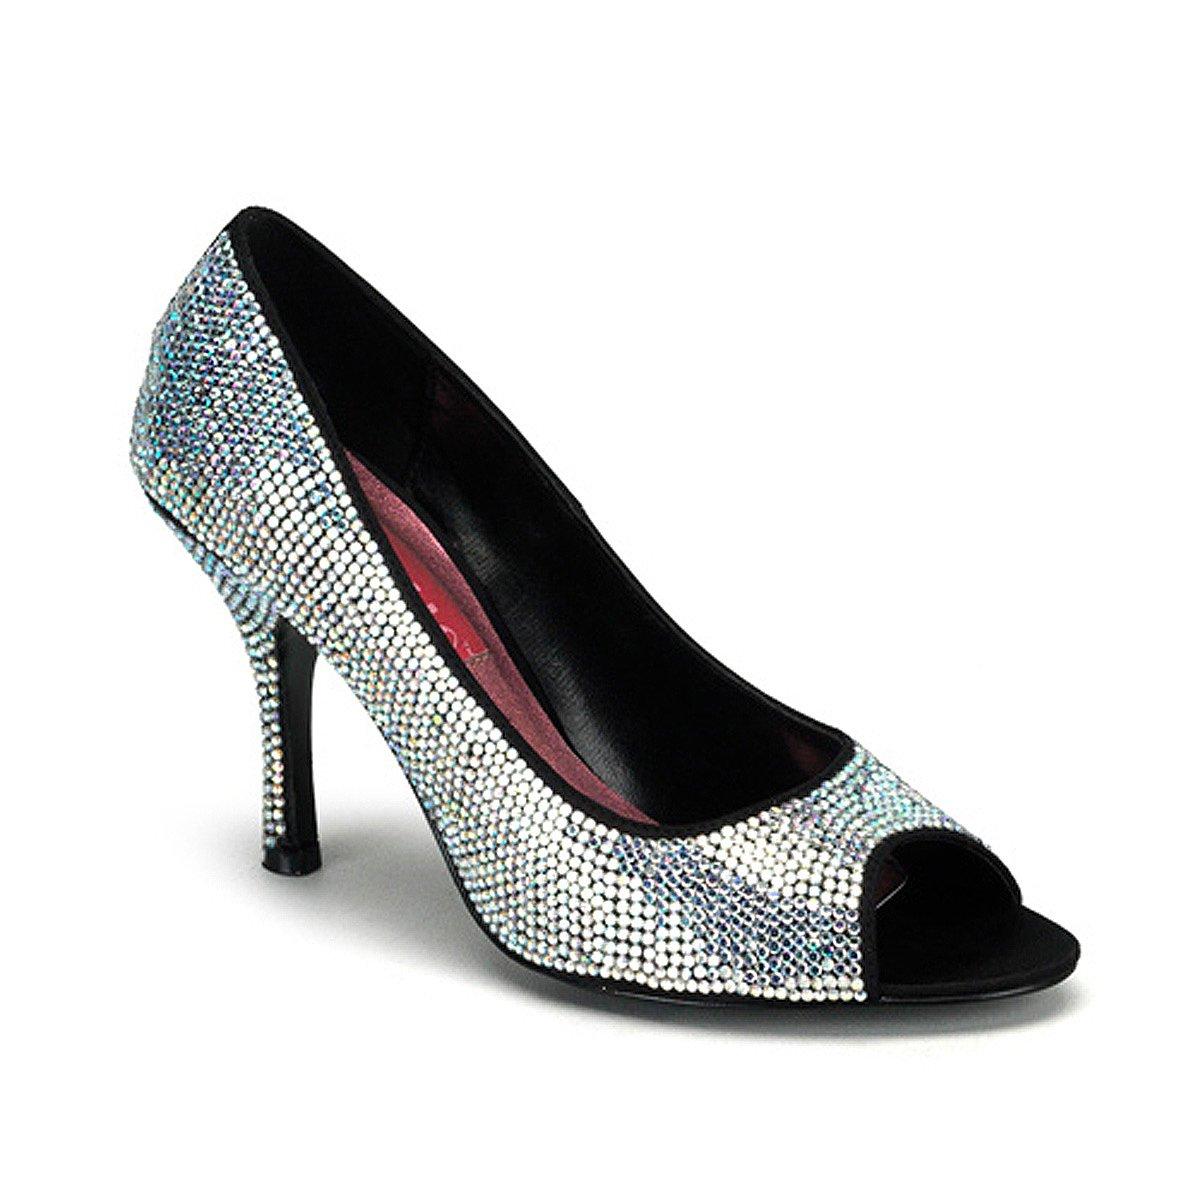 92b9f558b8f Amazon.com   Bordello 3 1/2 Inch Heel Rhinestone Peep Toe Pump Shoe ...